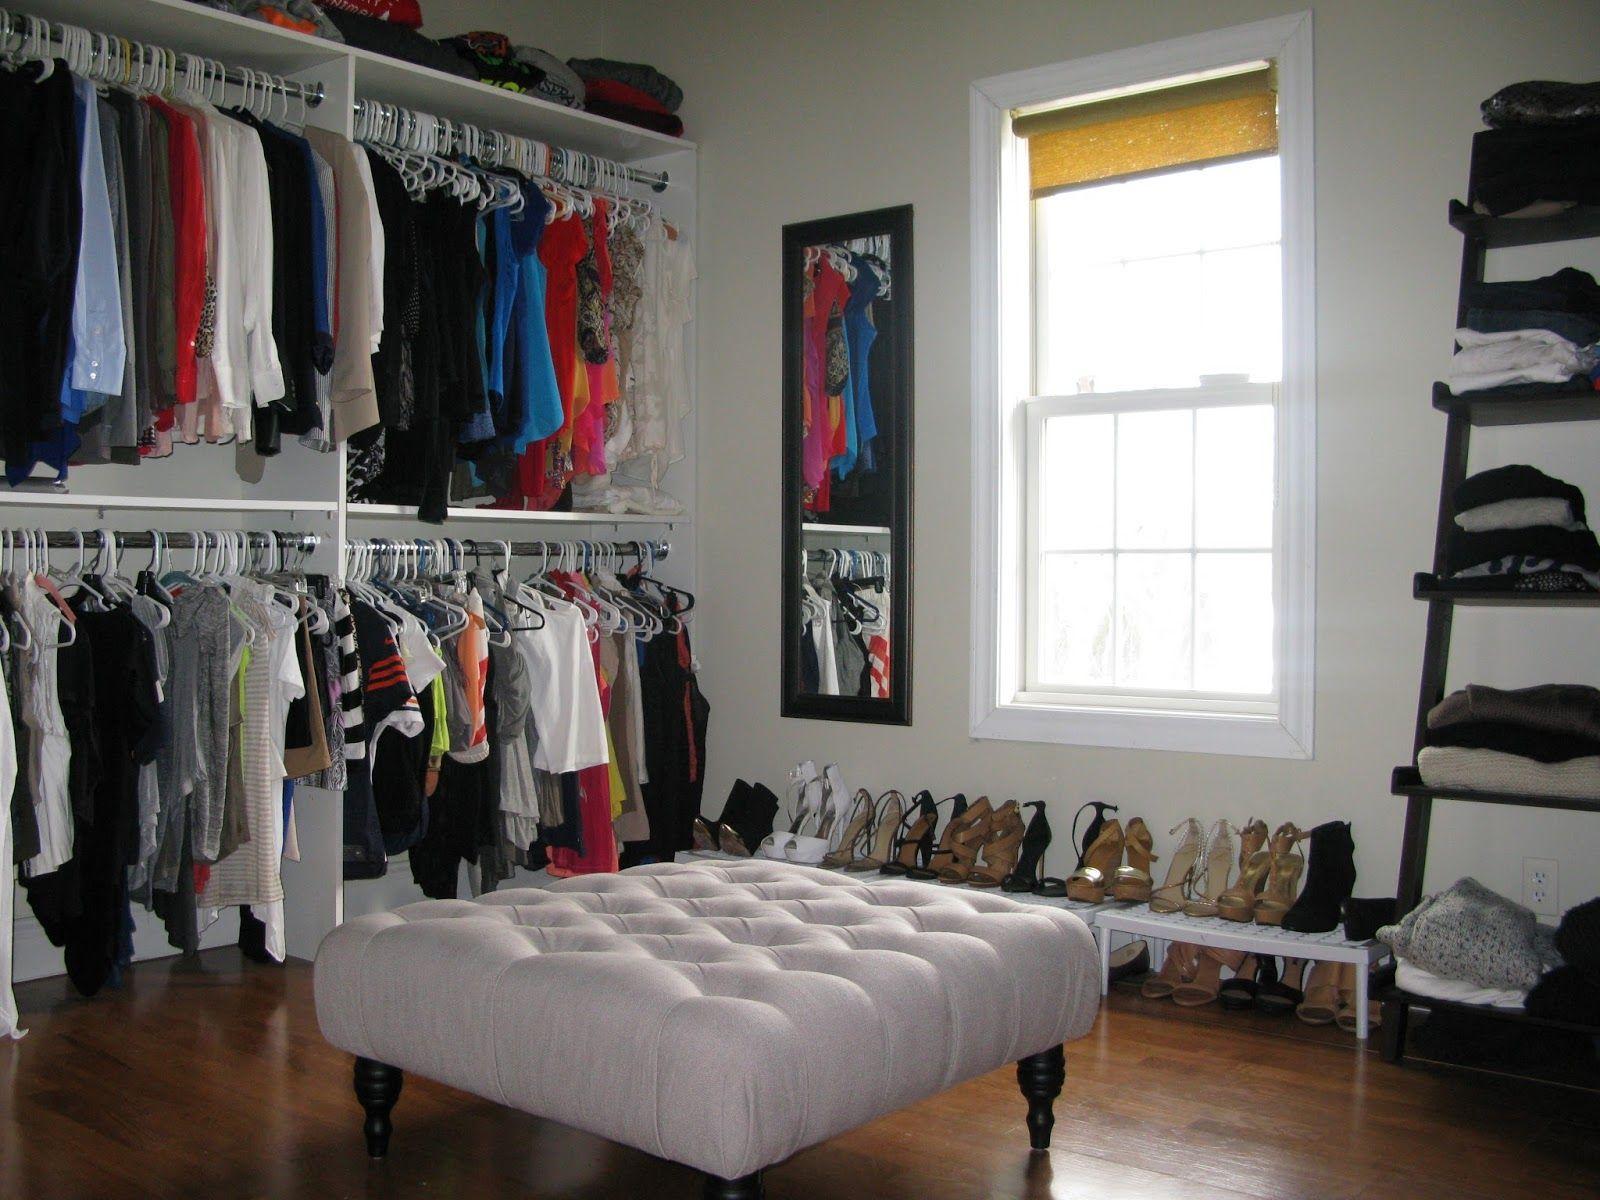 2jpg 16001200 pixels spare bedroom closets bedroom